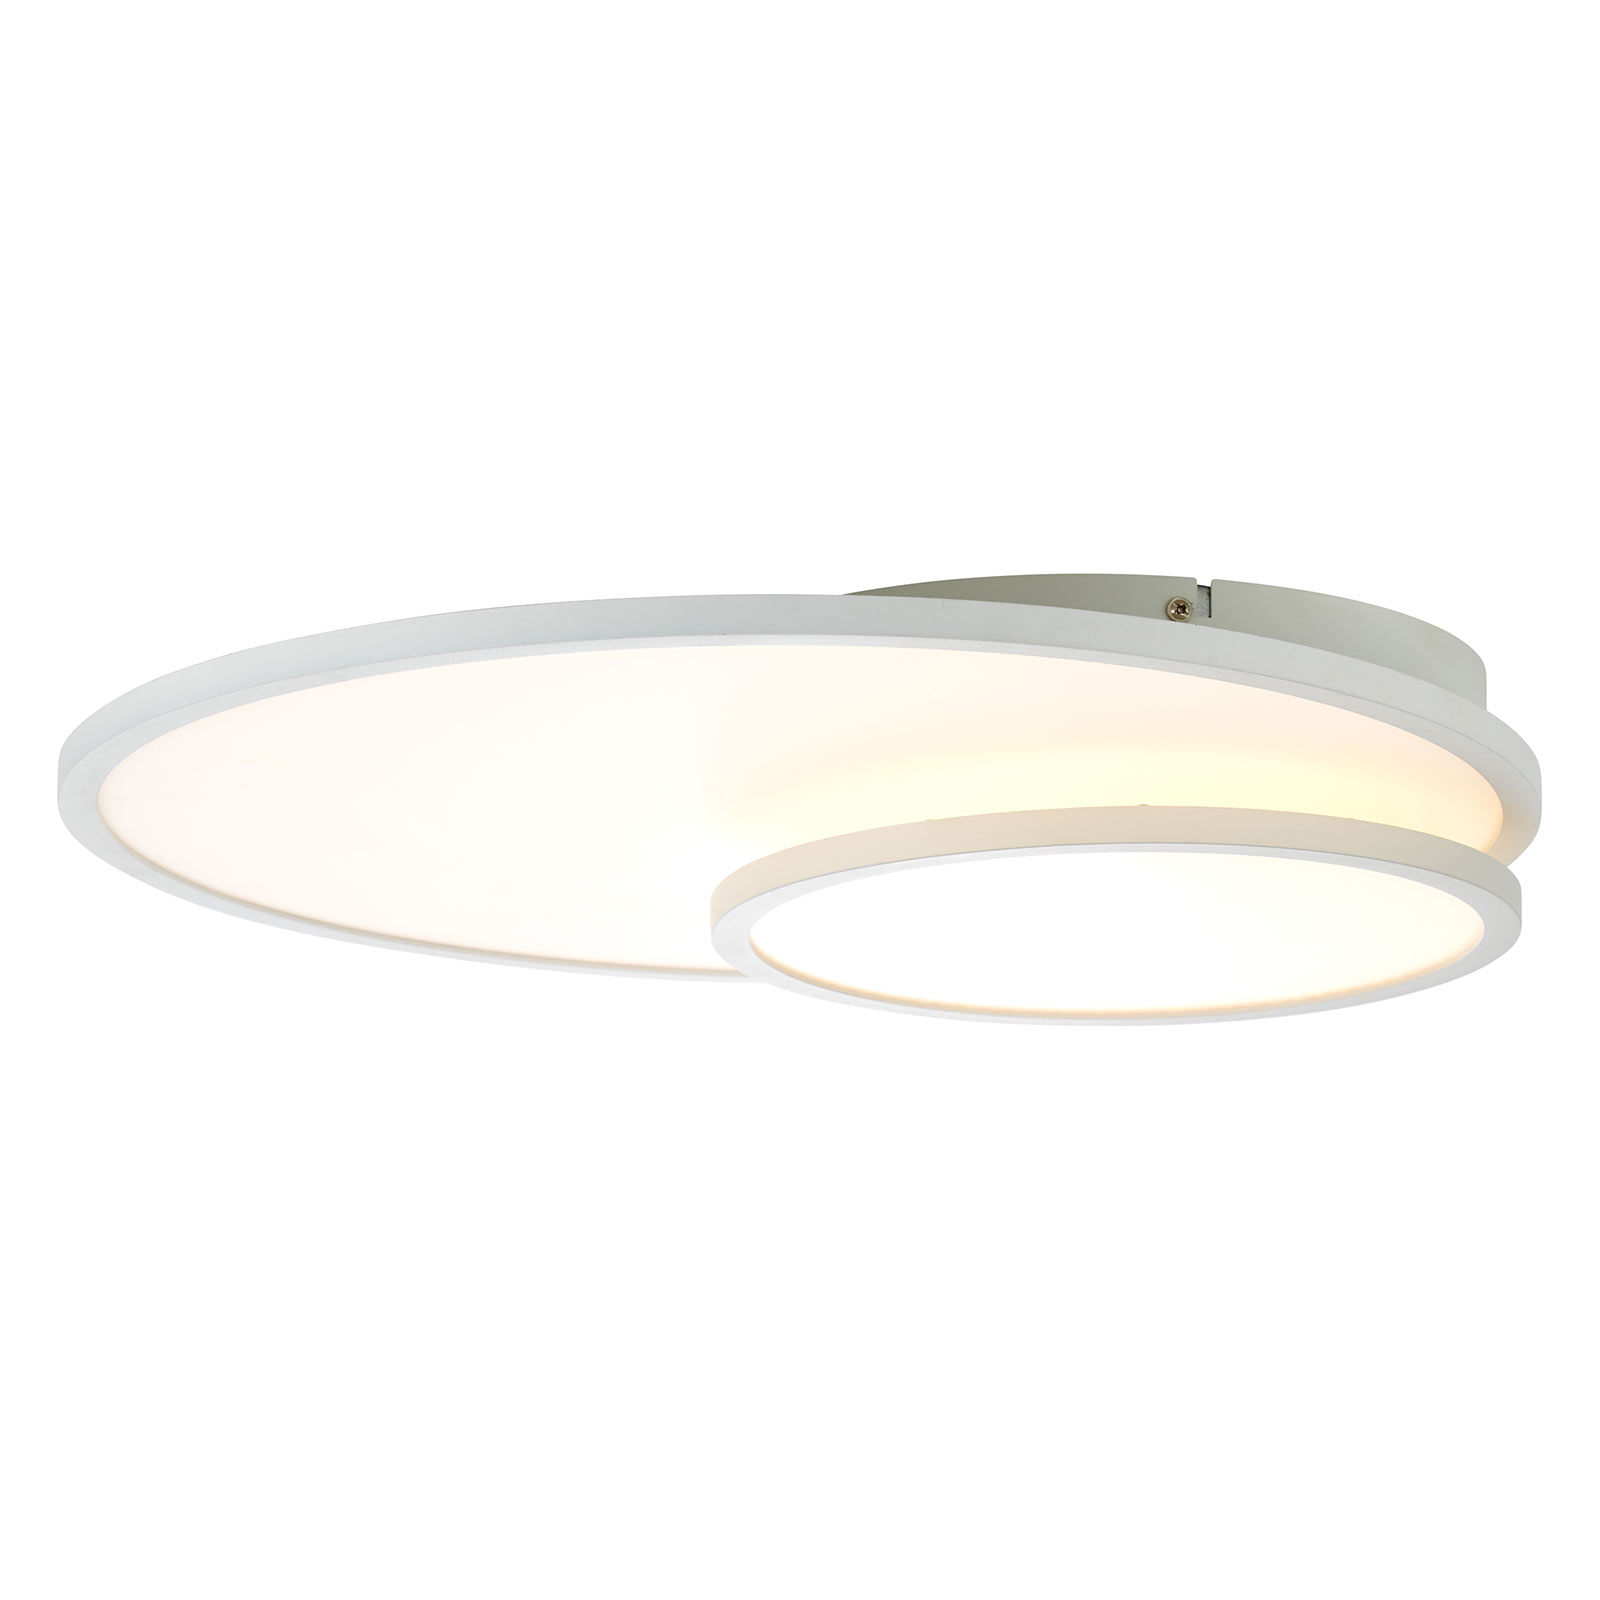 Lámpara LED de techo Bility, redonda, marco blanco